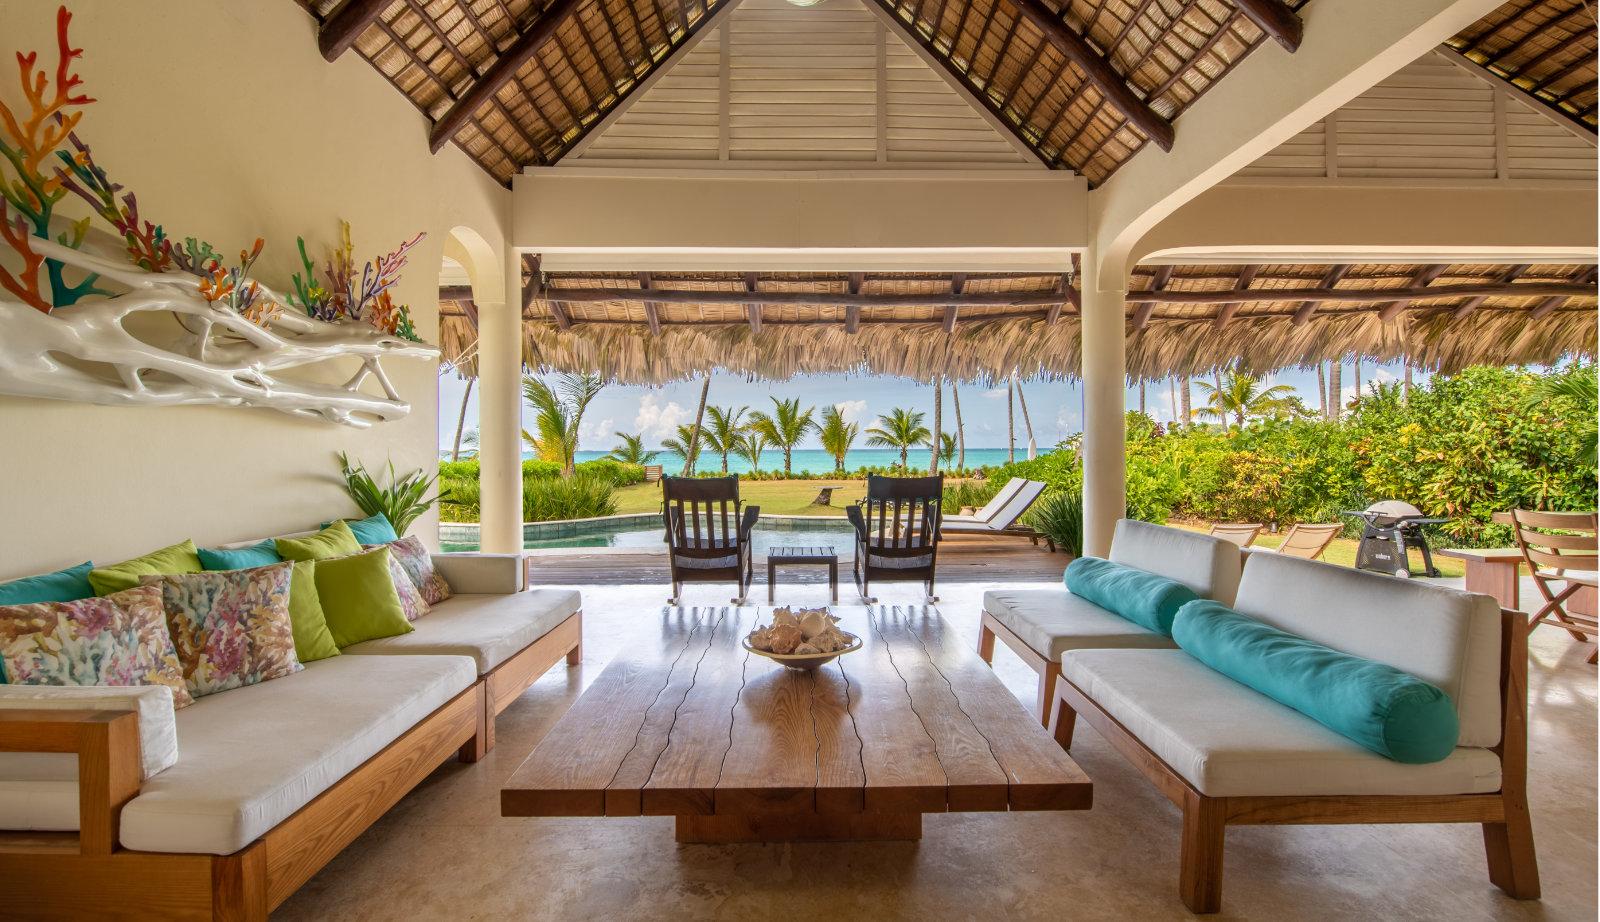 Beach House Luxury Villa Rental In Las Terrenas Samana